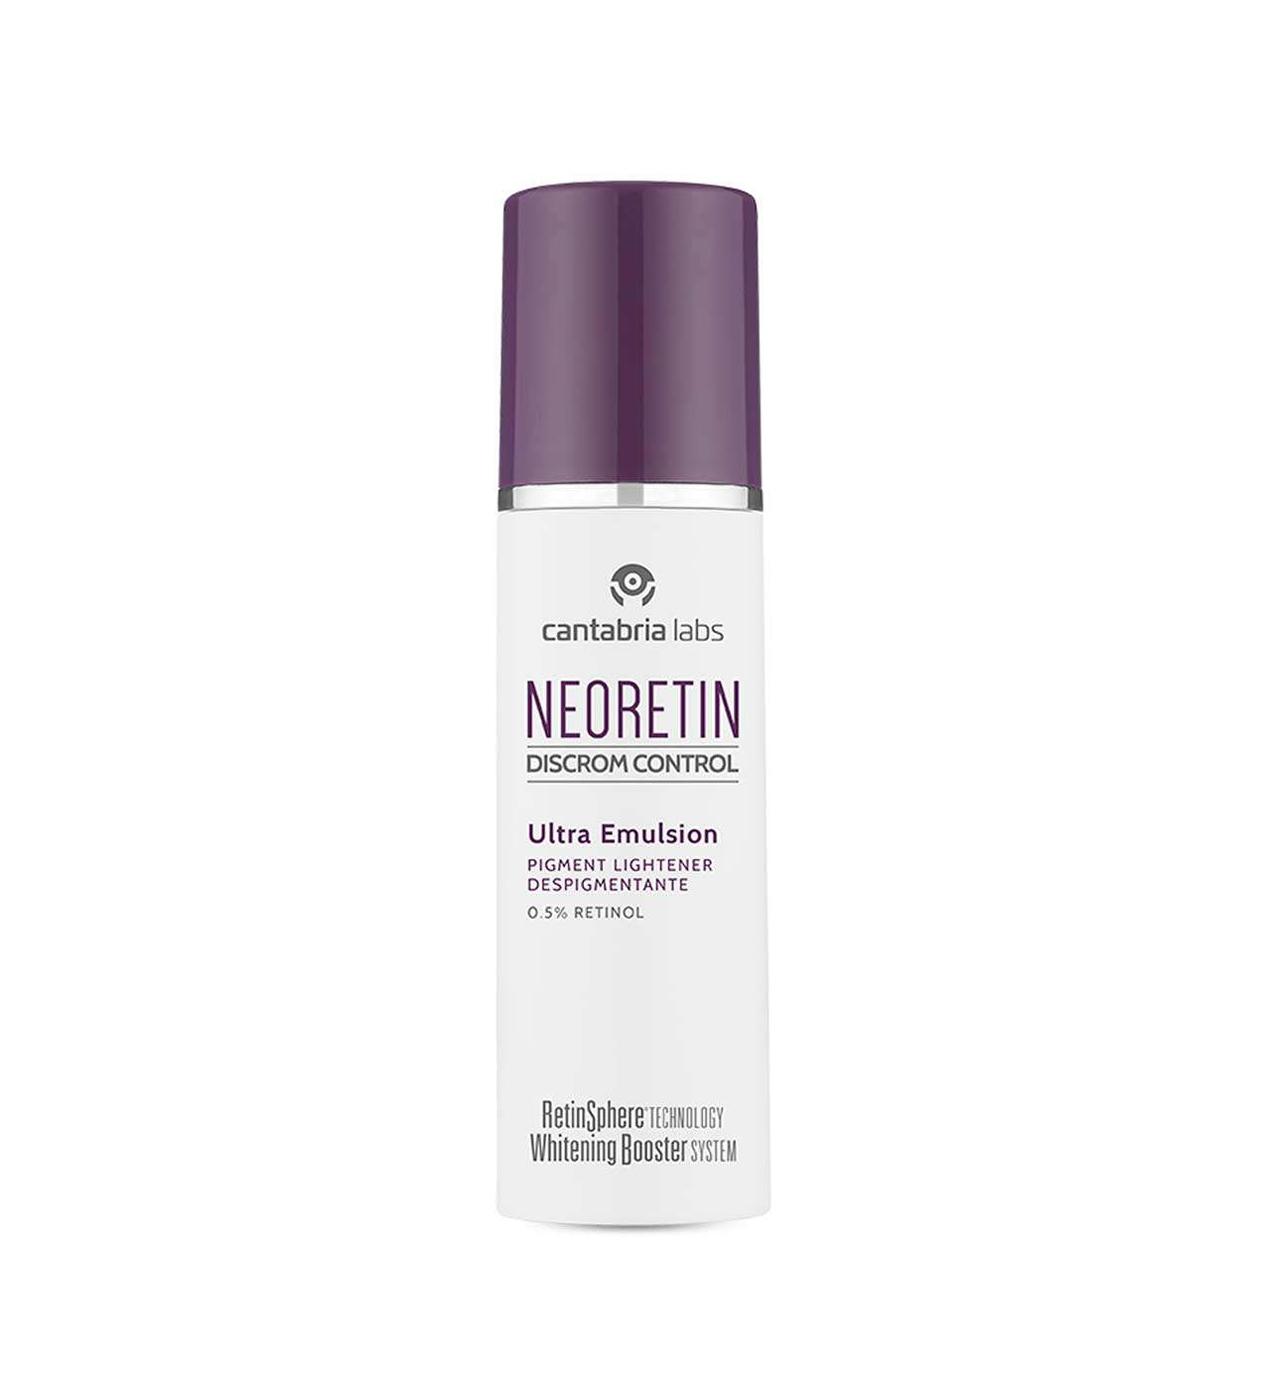 Neoretin Discrom Control Ultra Emulsión Despigmentante